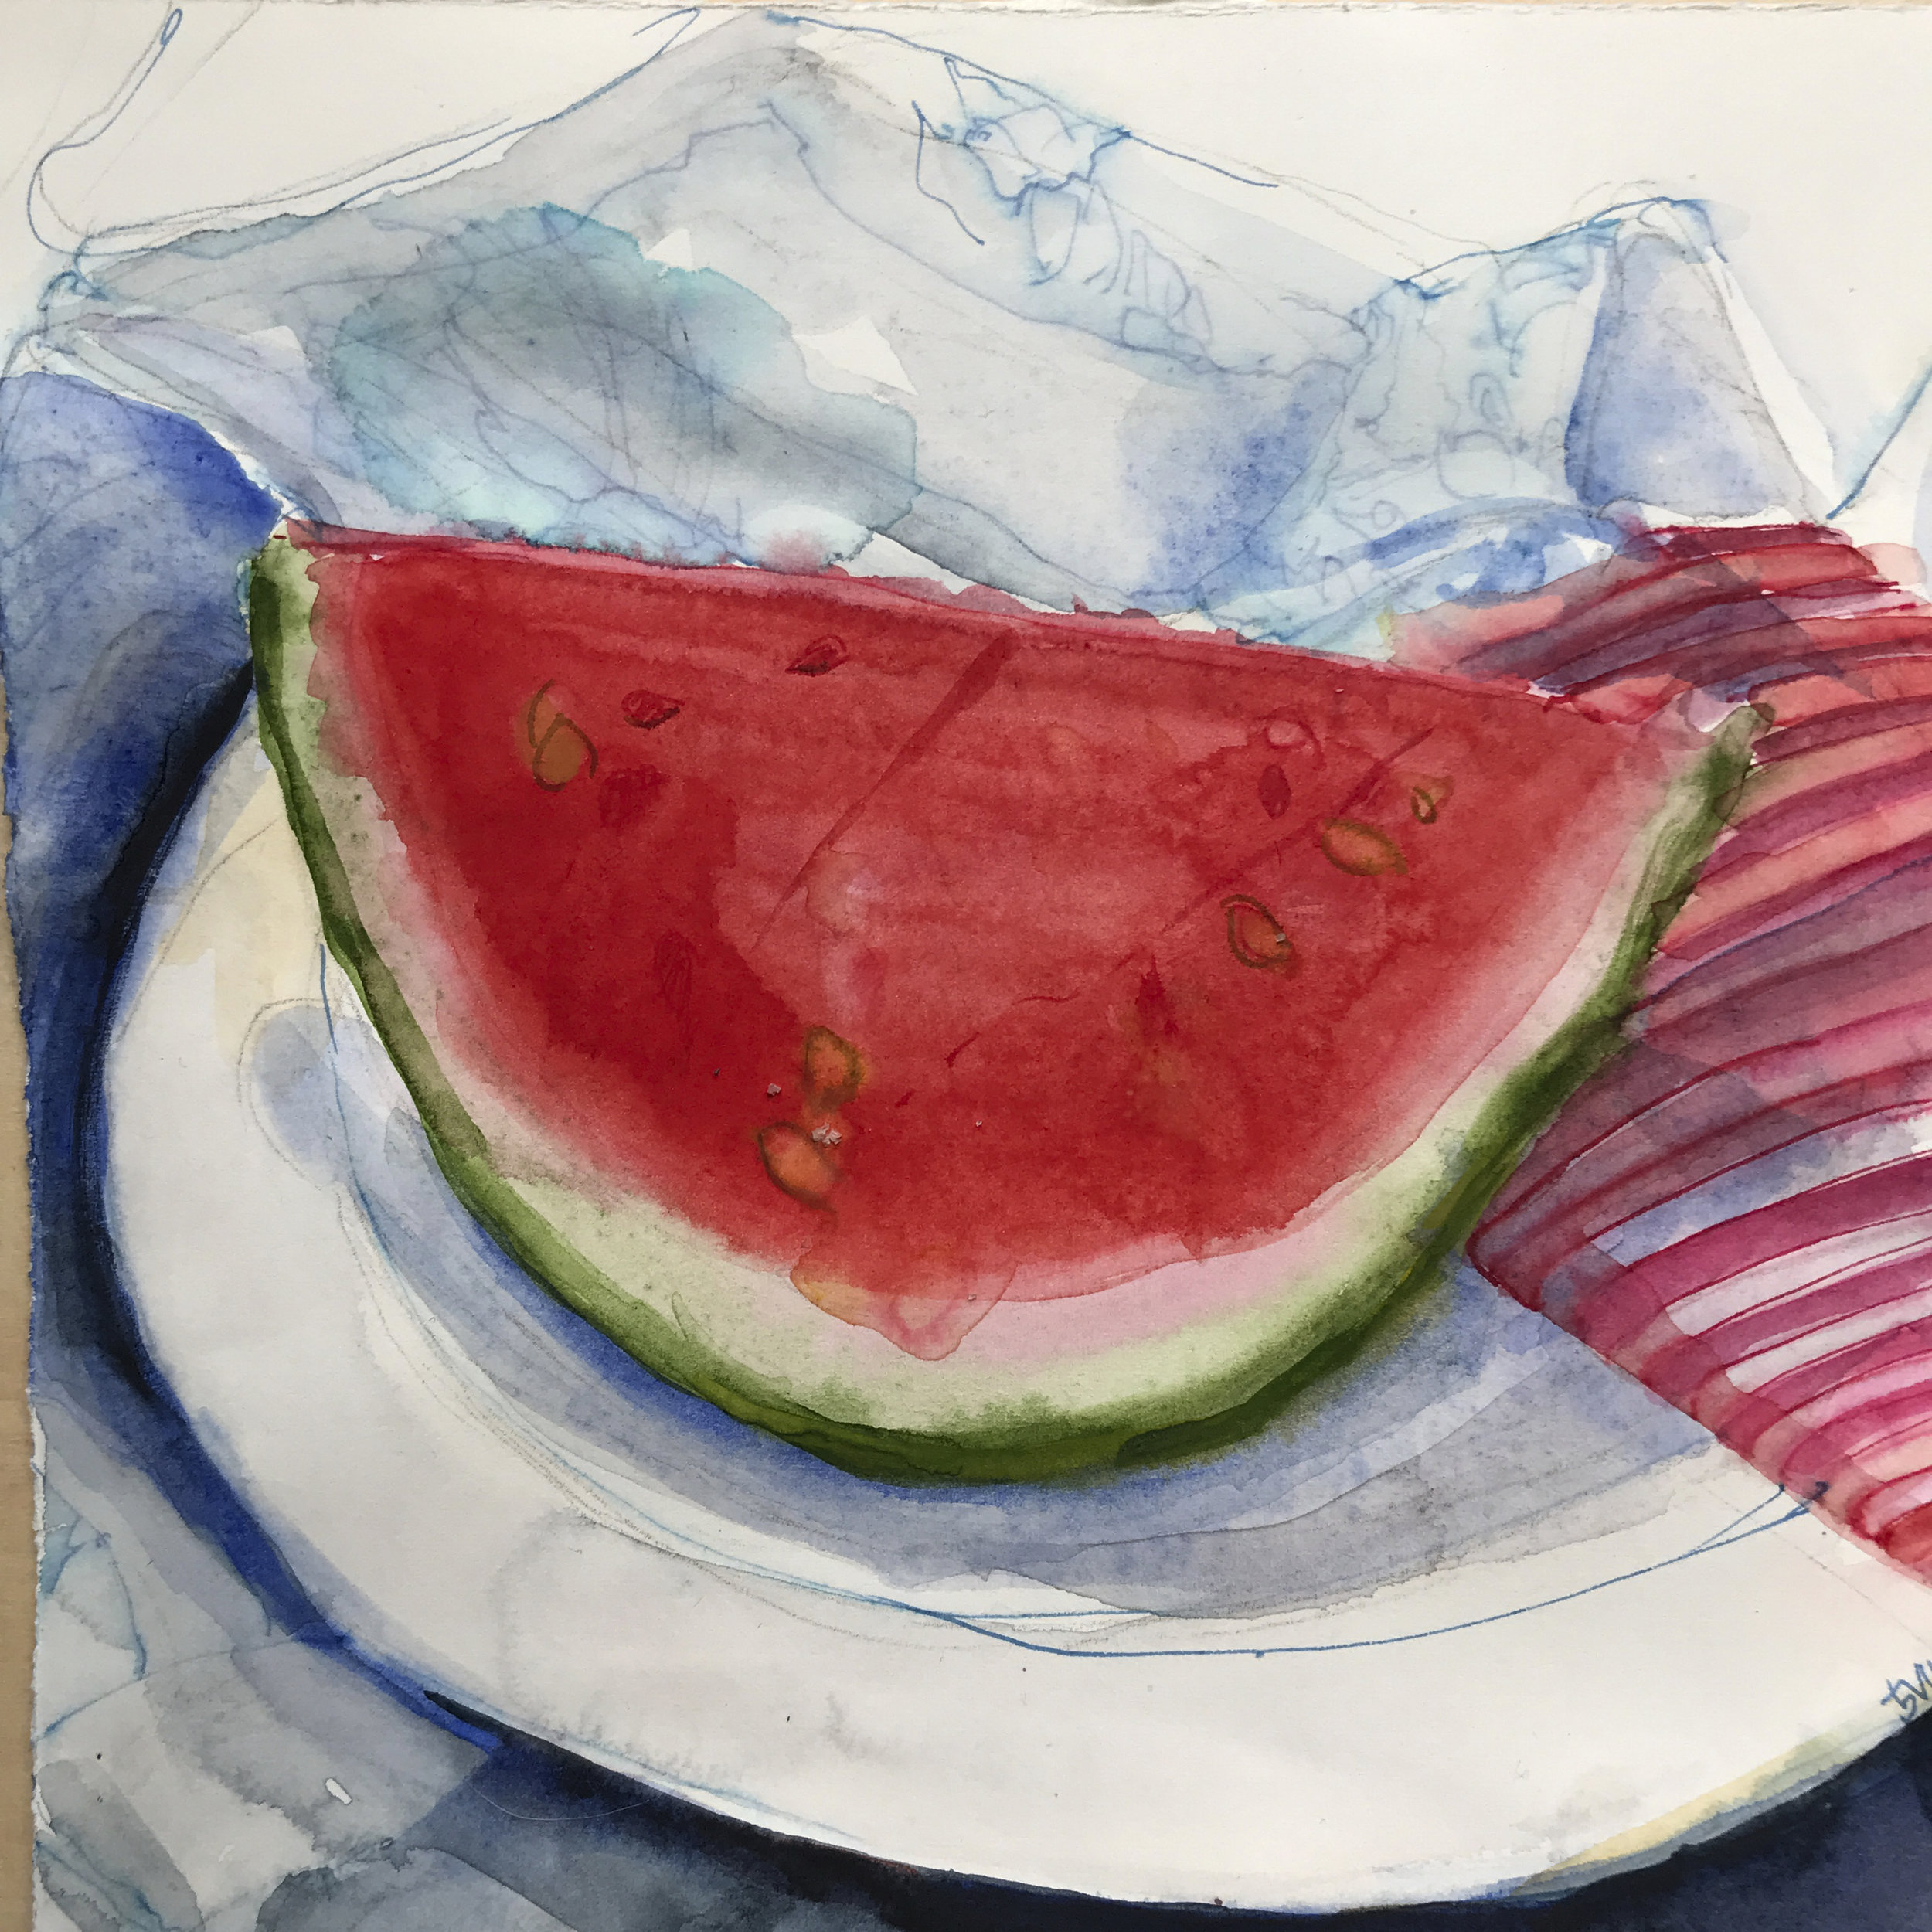 fresh watermelon 958